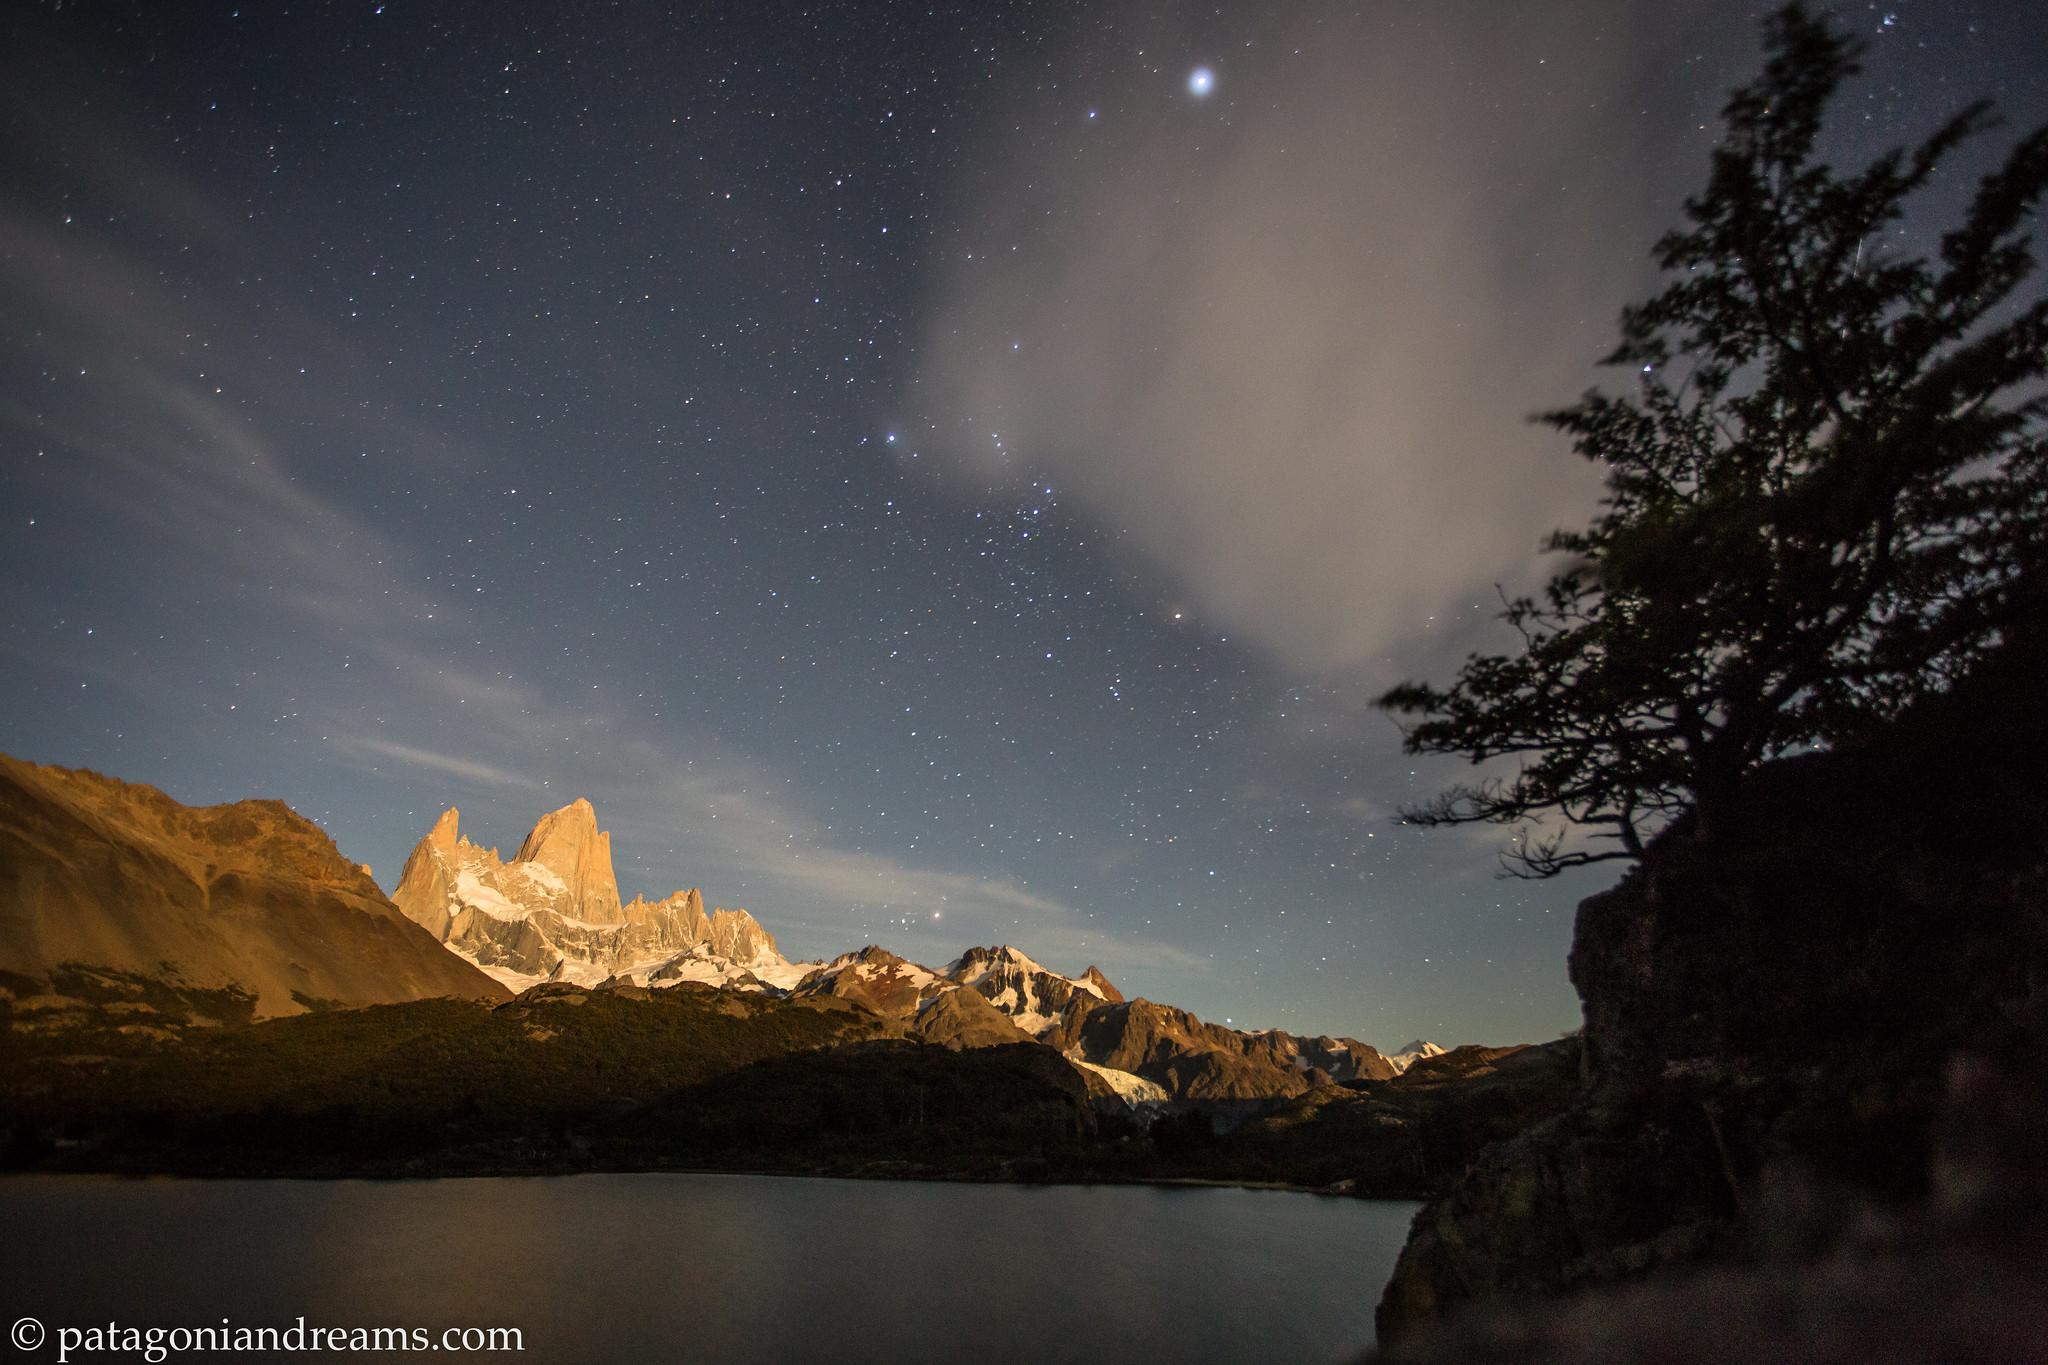 Laguna Capri by night, NP Los Glaciares, Patagonia, Argentina.